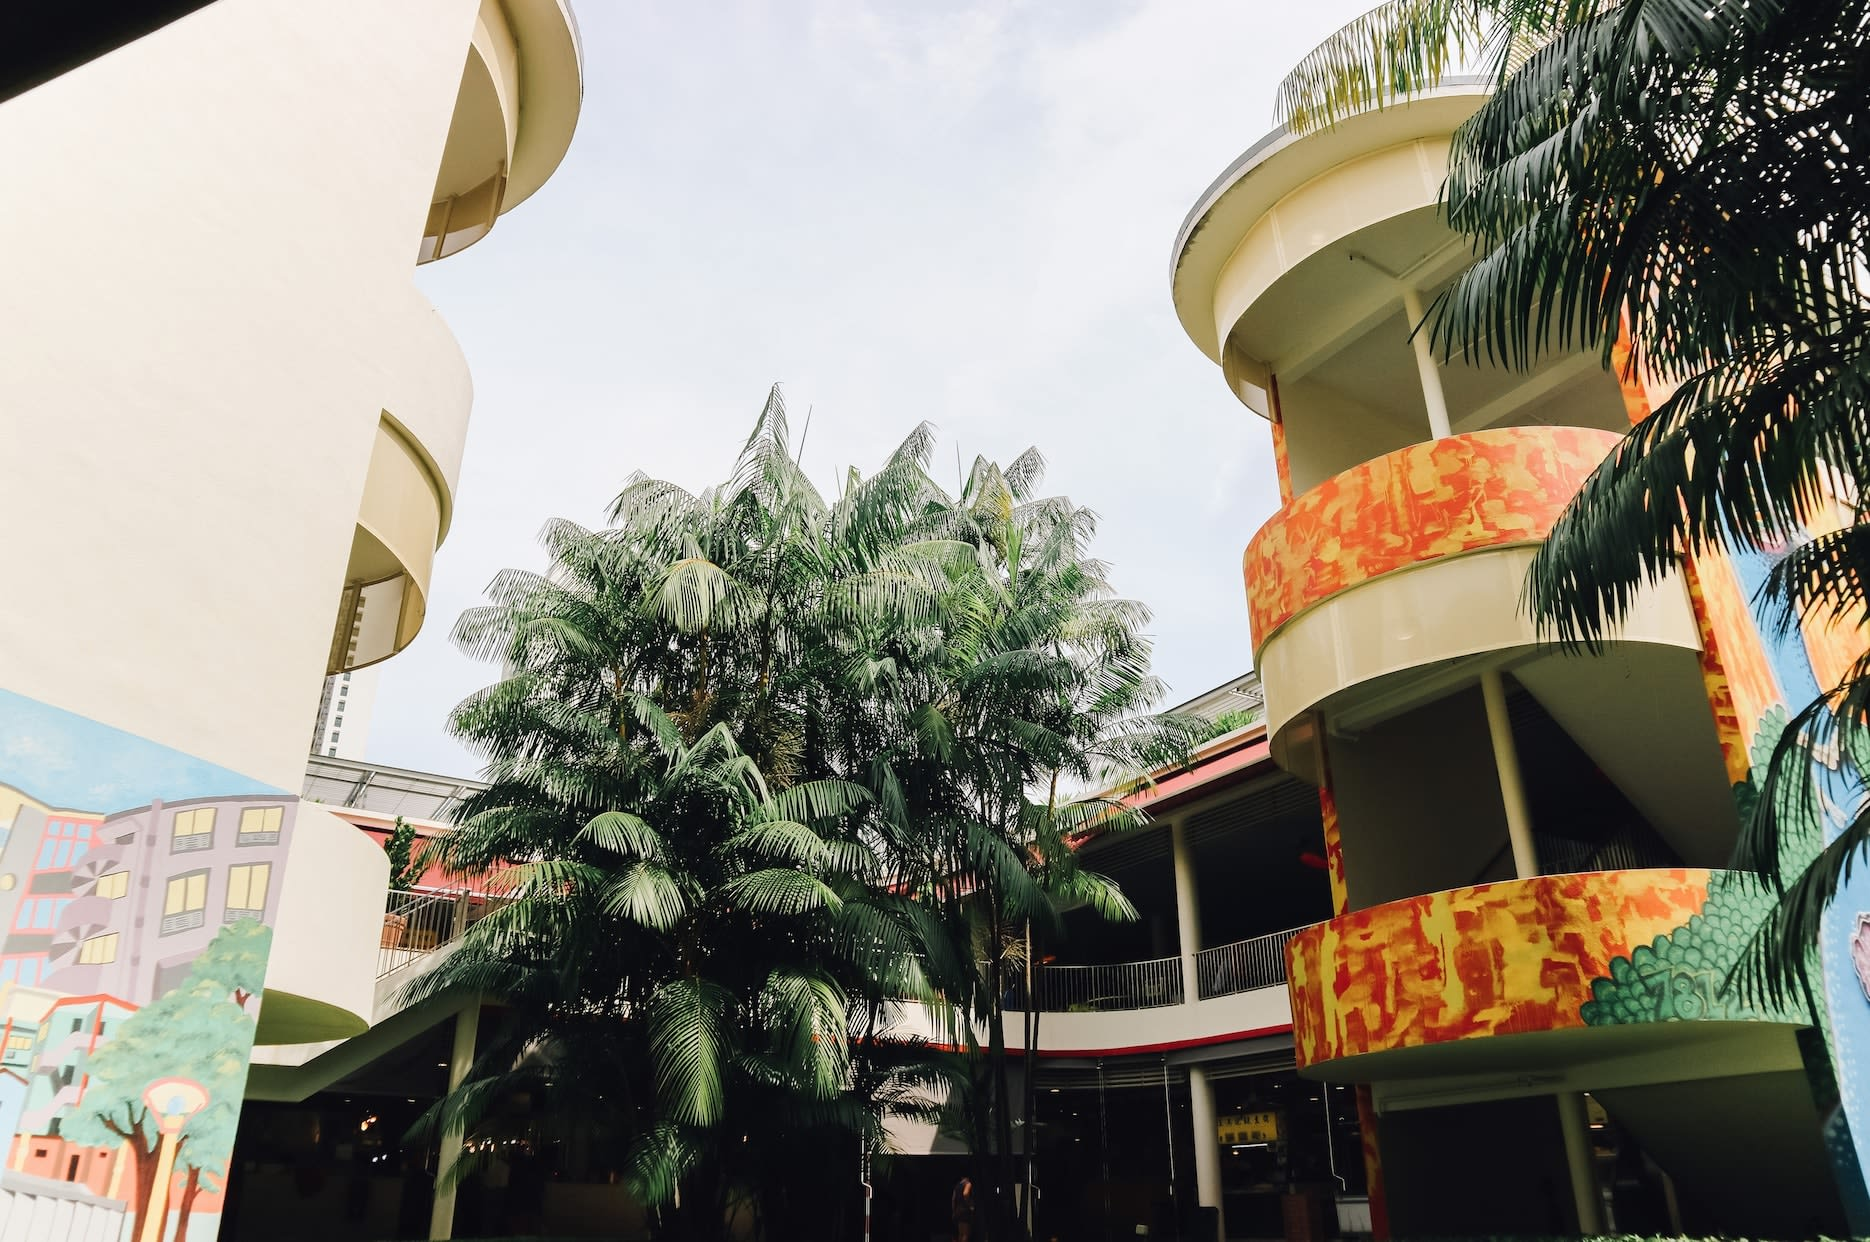 tiong bahru flats and shophouses